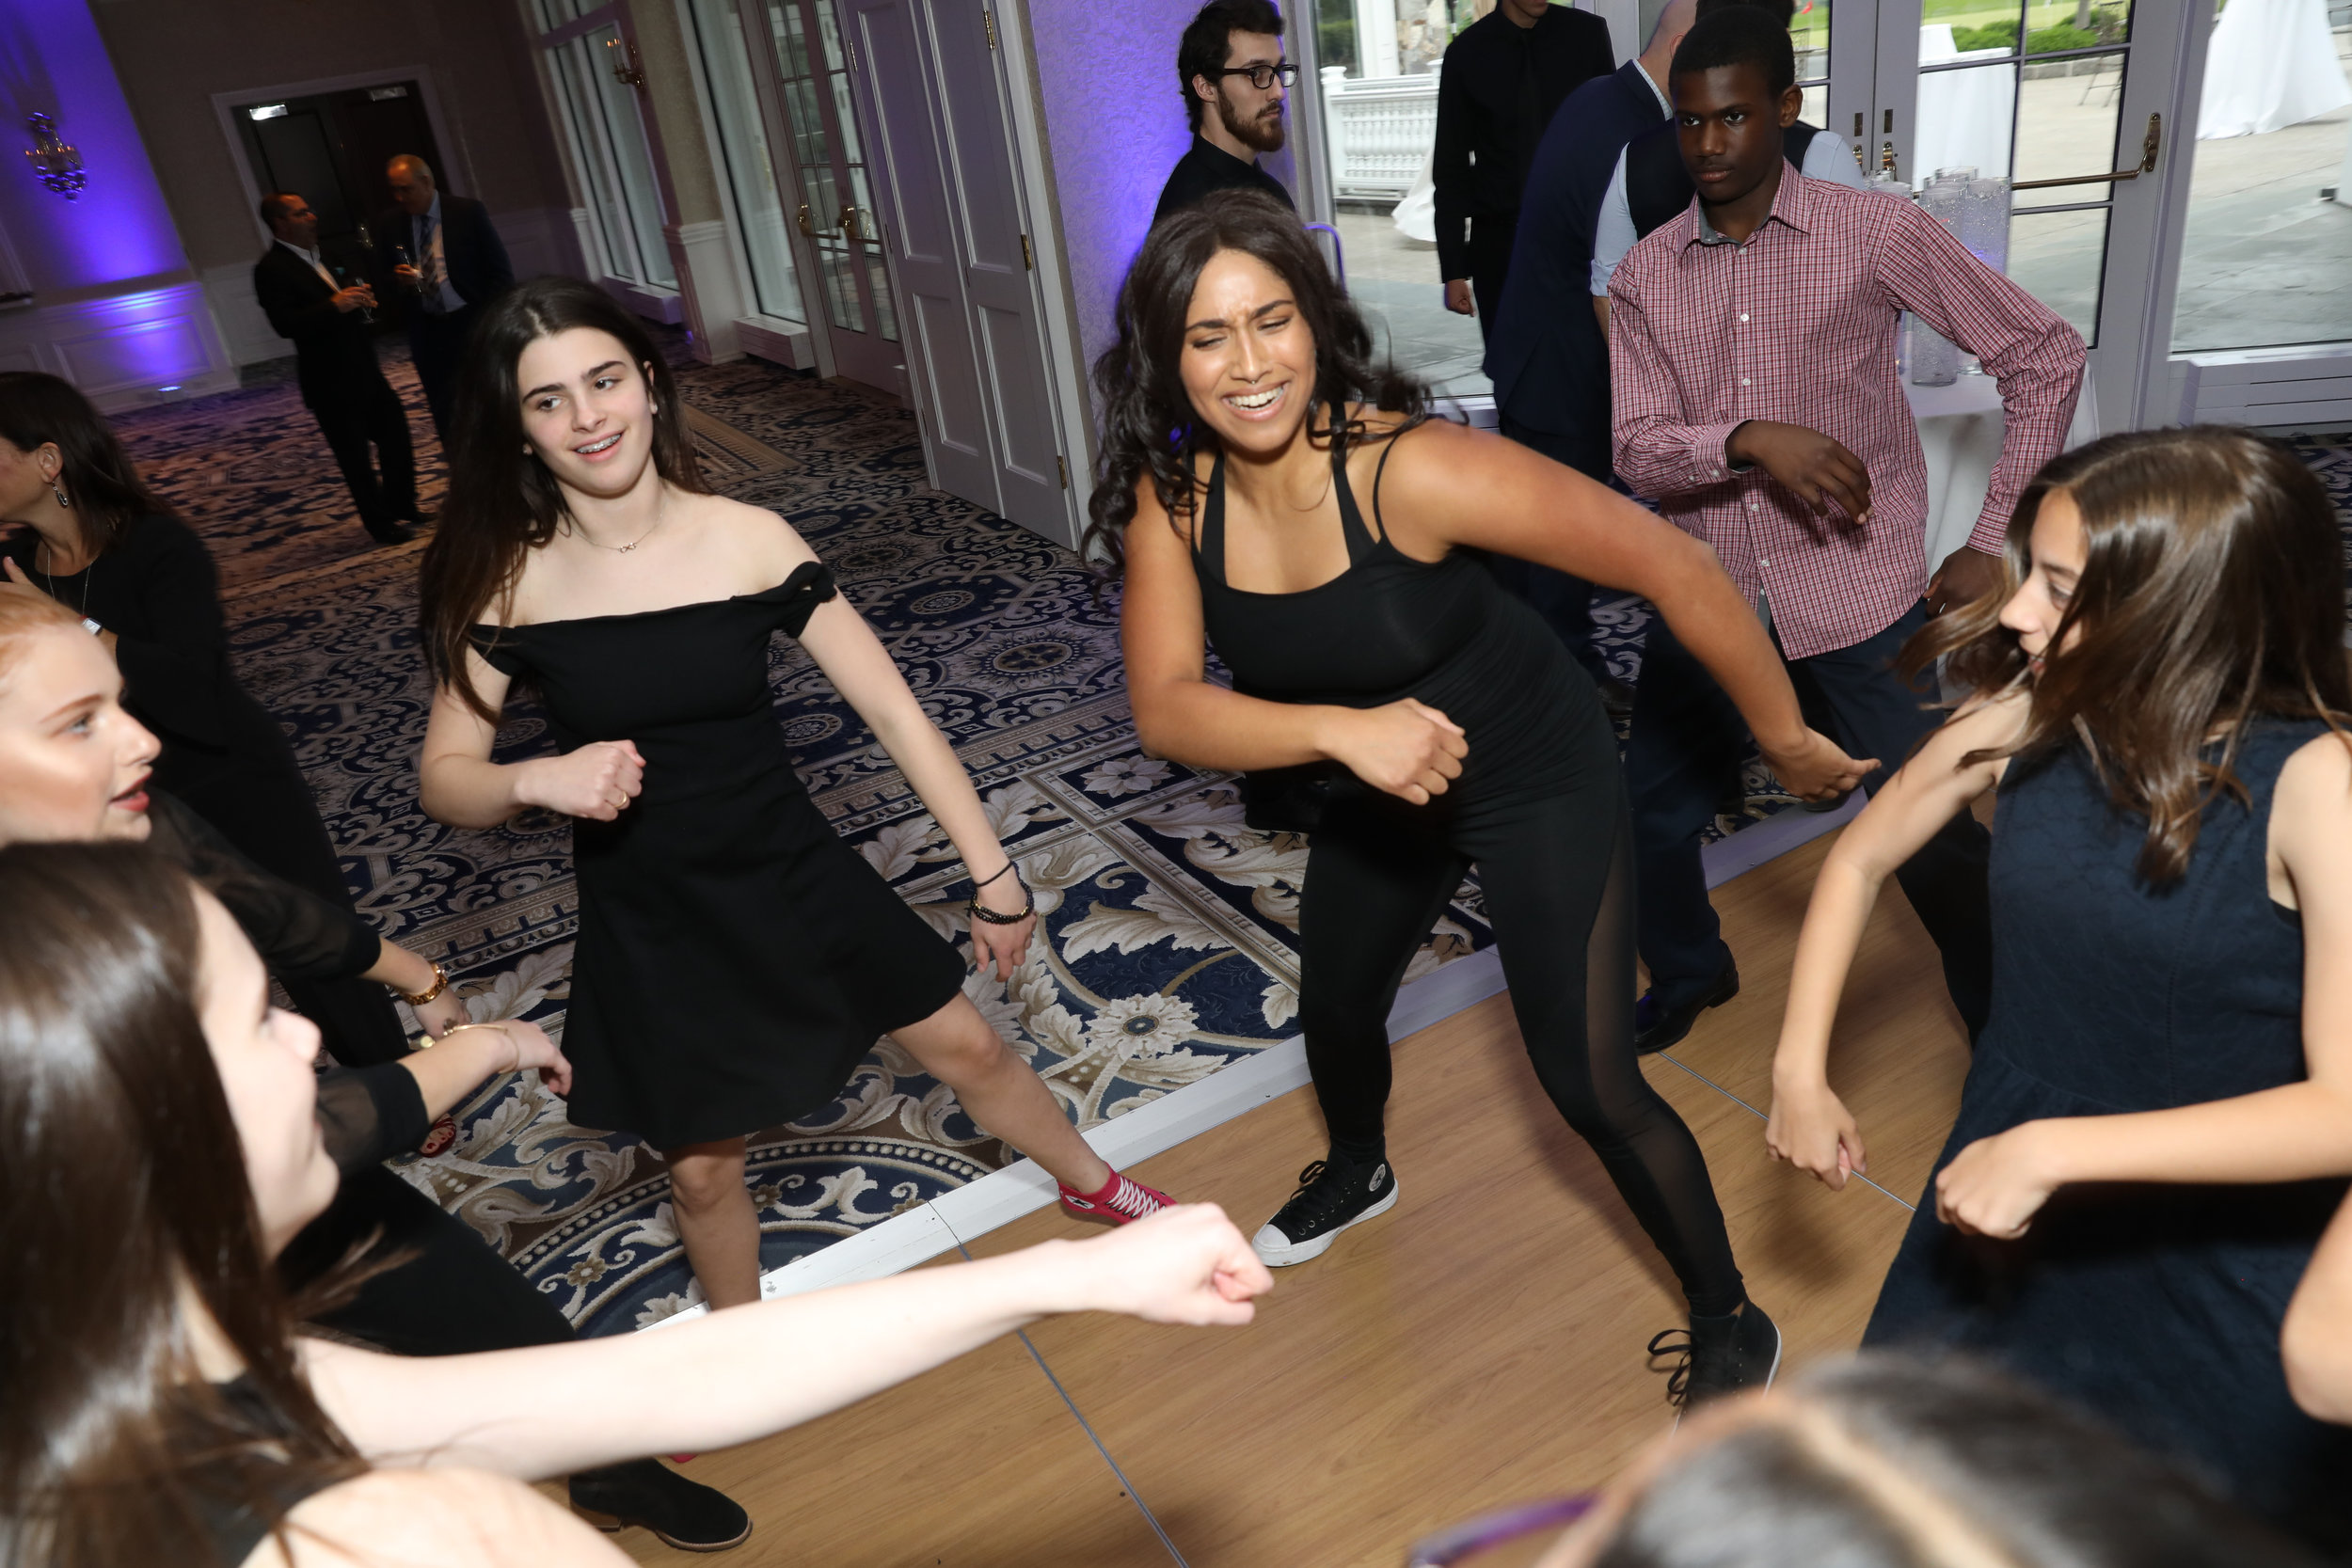 Dancer Motivator Action @ Bar Mitzvah